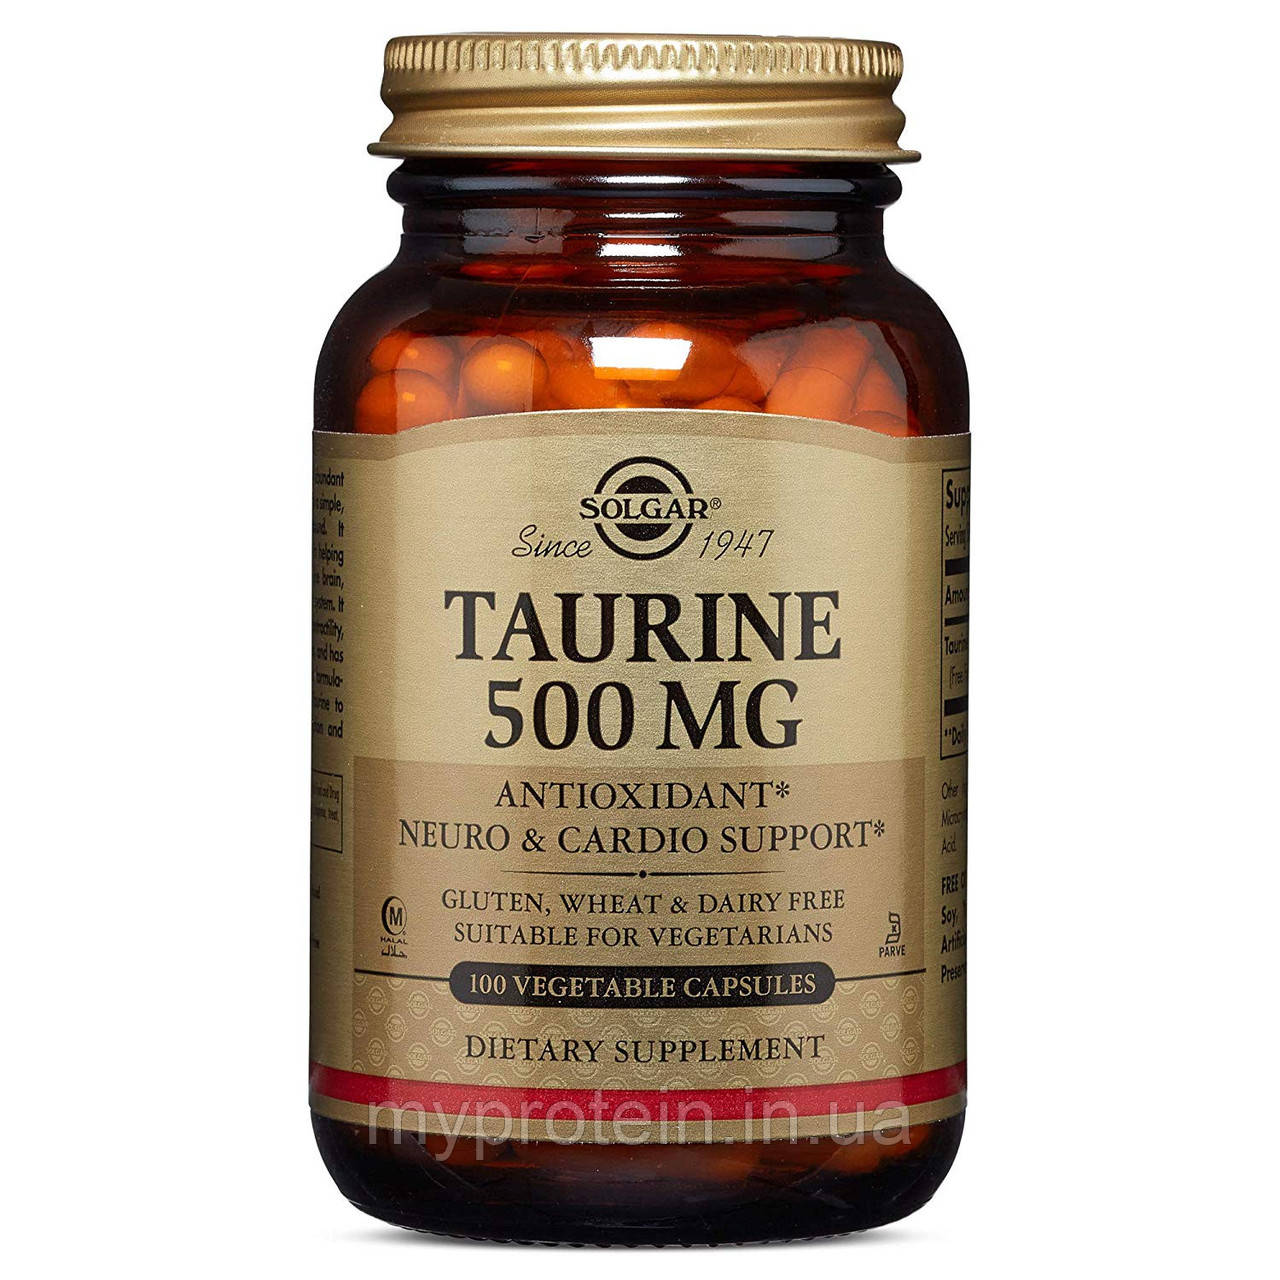 SolgarТаурин Taurine 500 mg100 veg caps